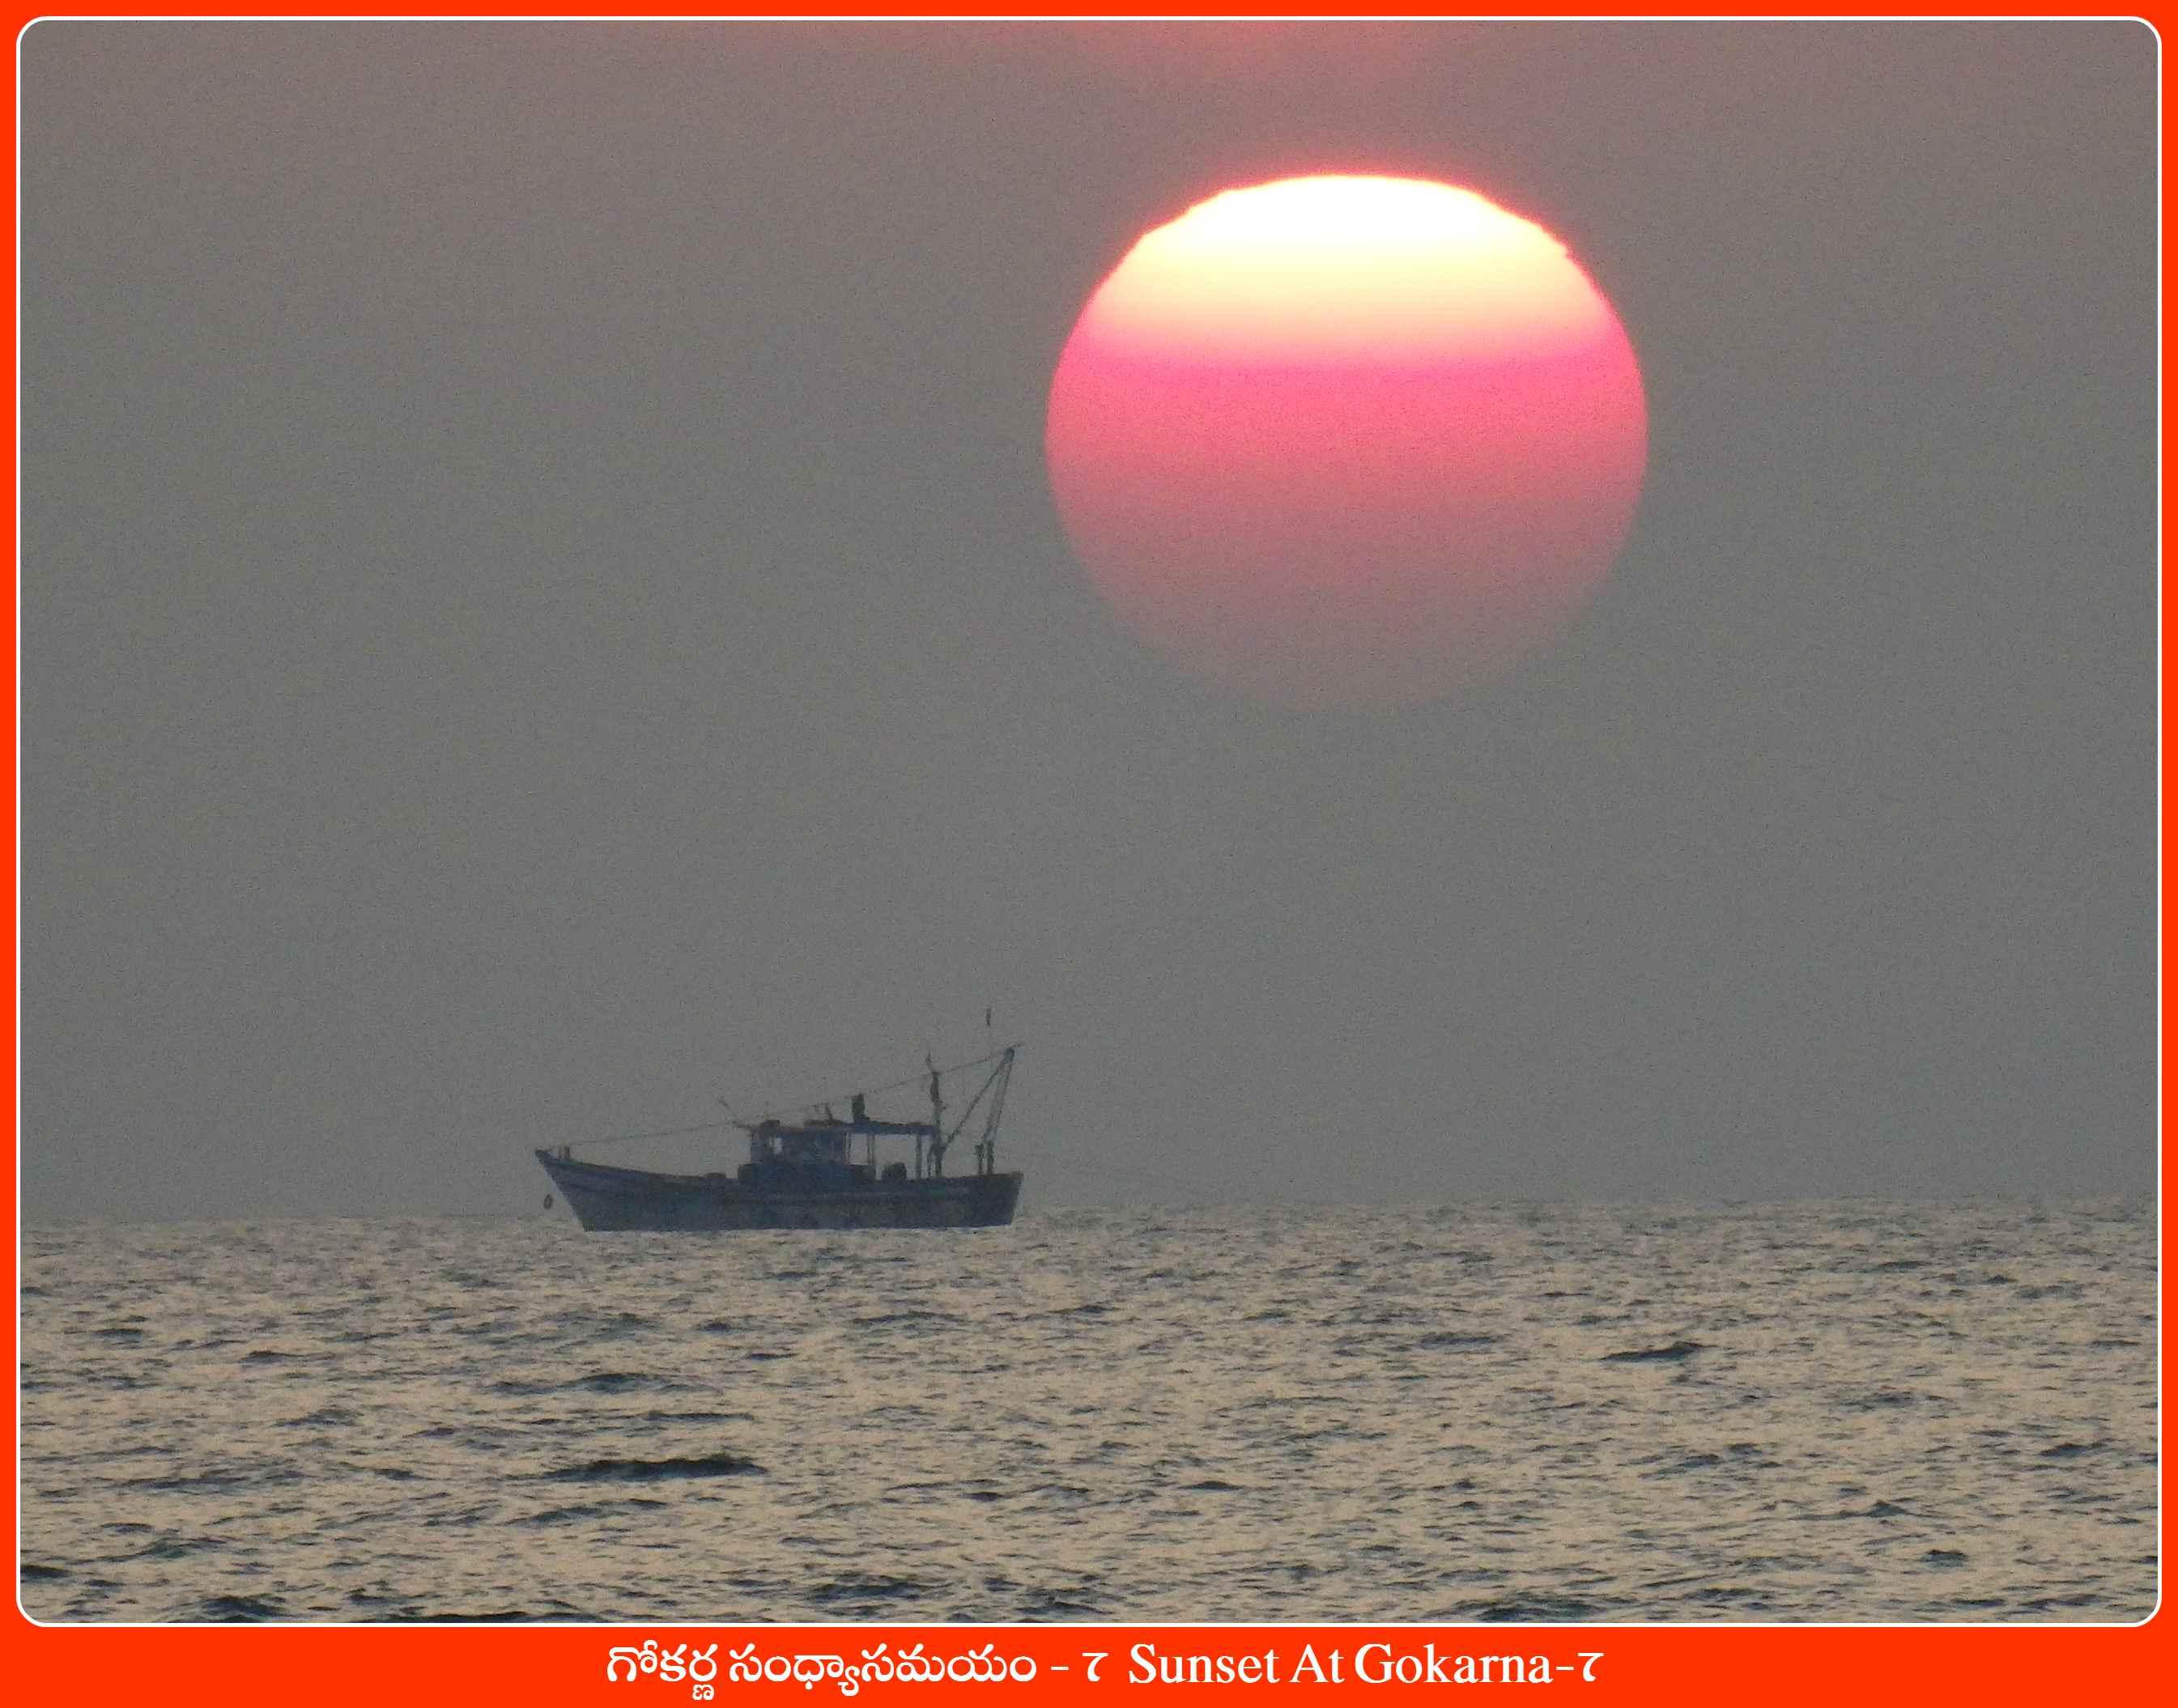 Sunset At Gokarna-7